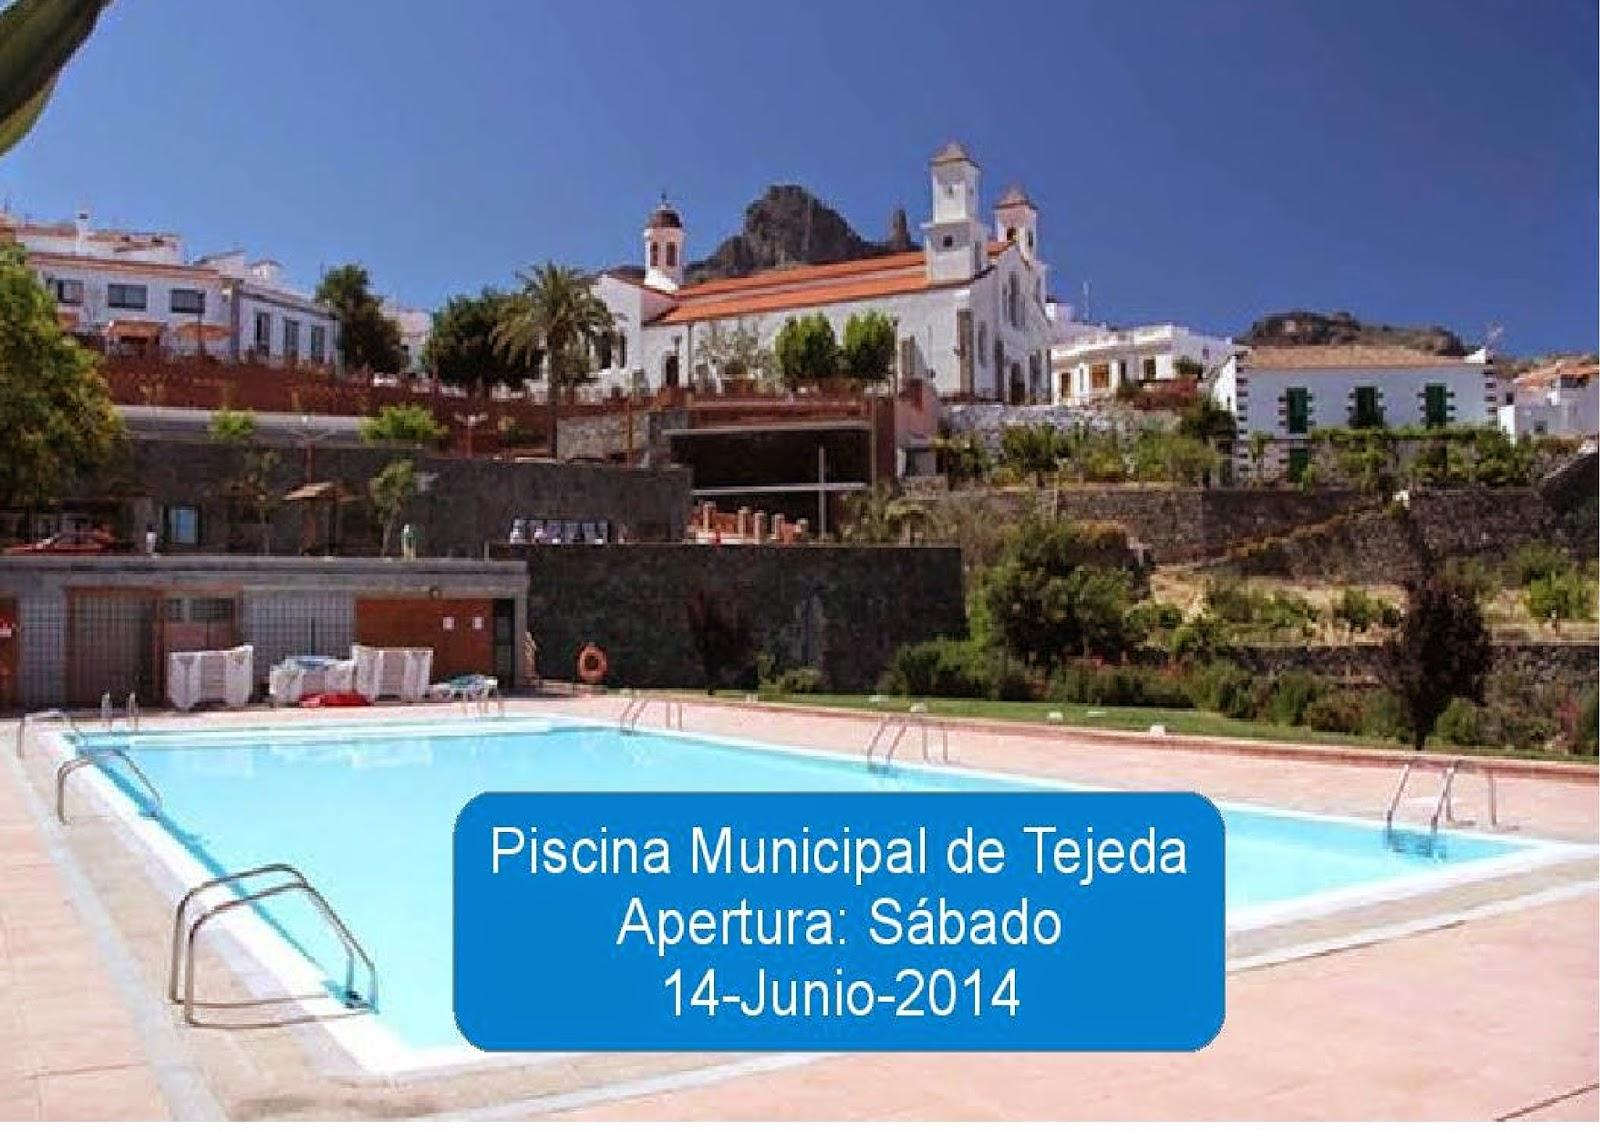 La piscina municipal de tejeda abrir a for Piscina municipal de salt